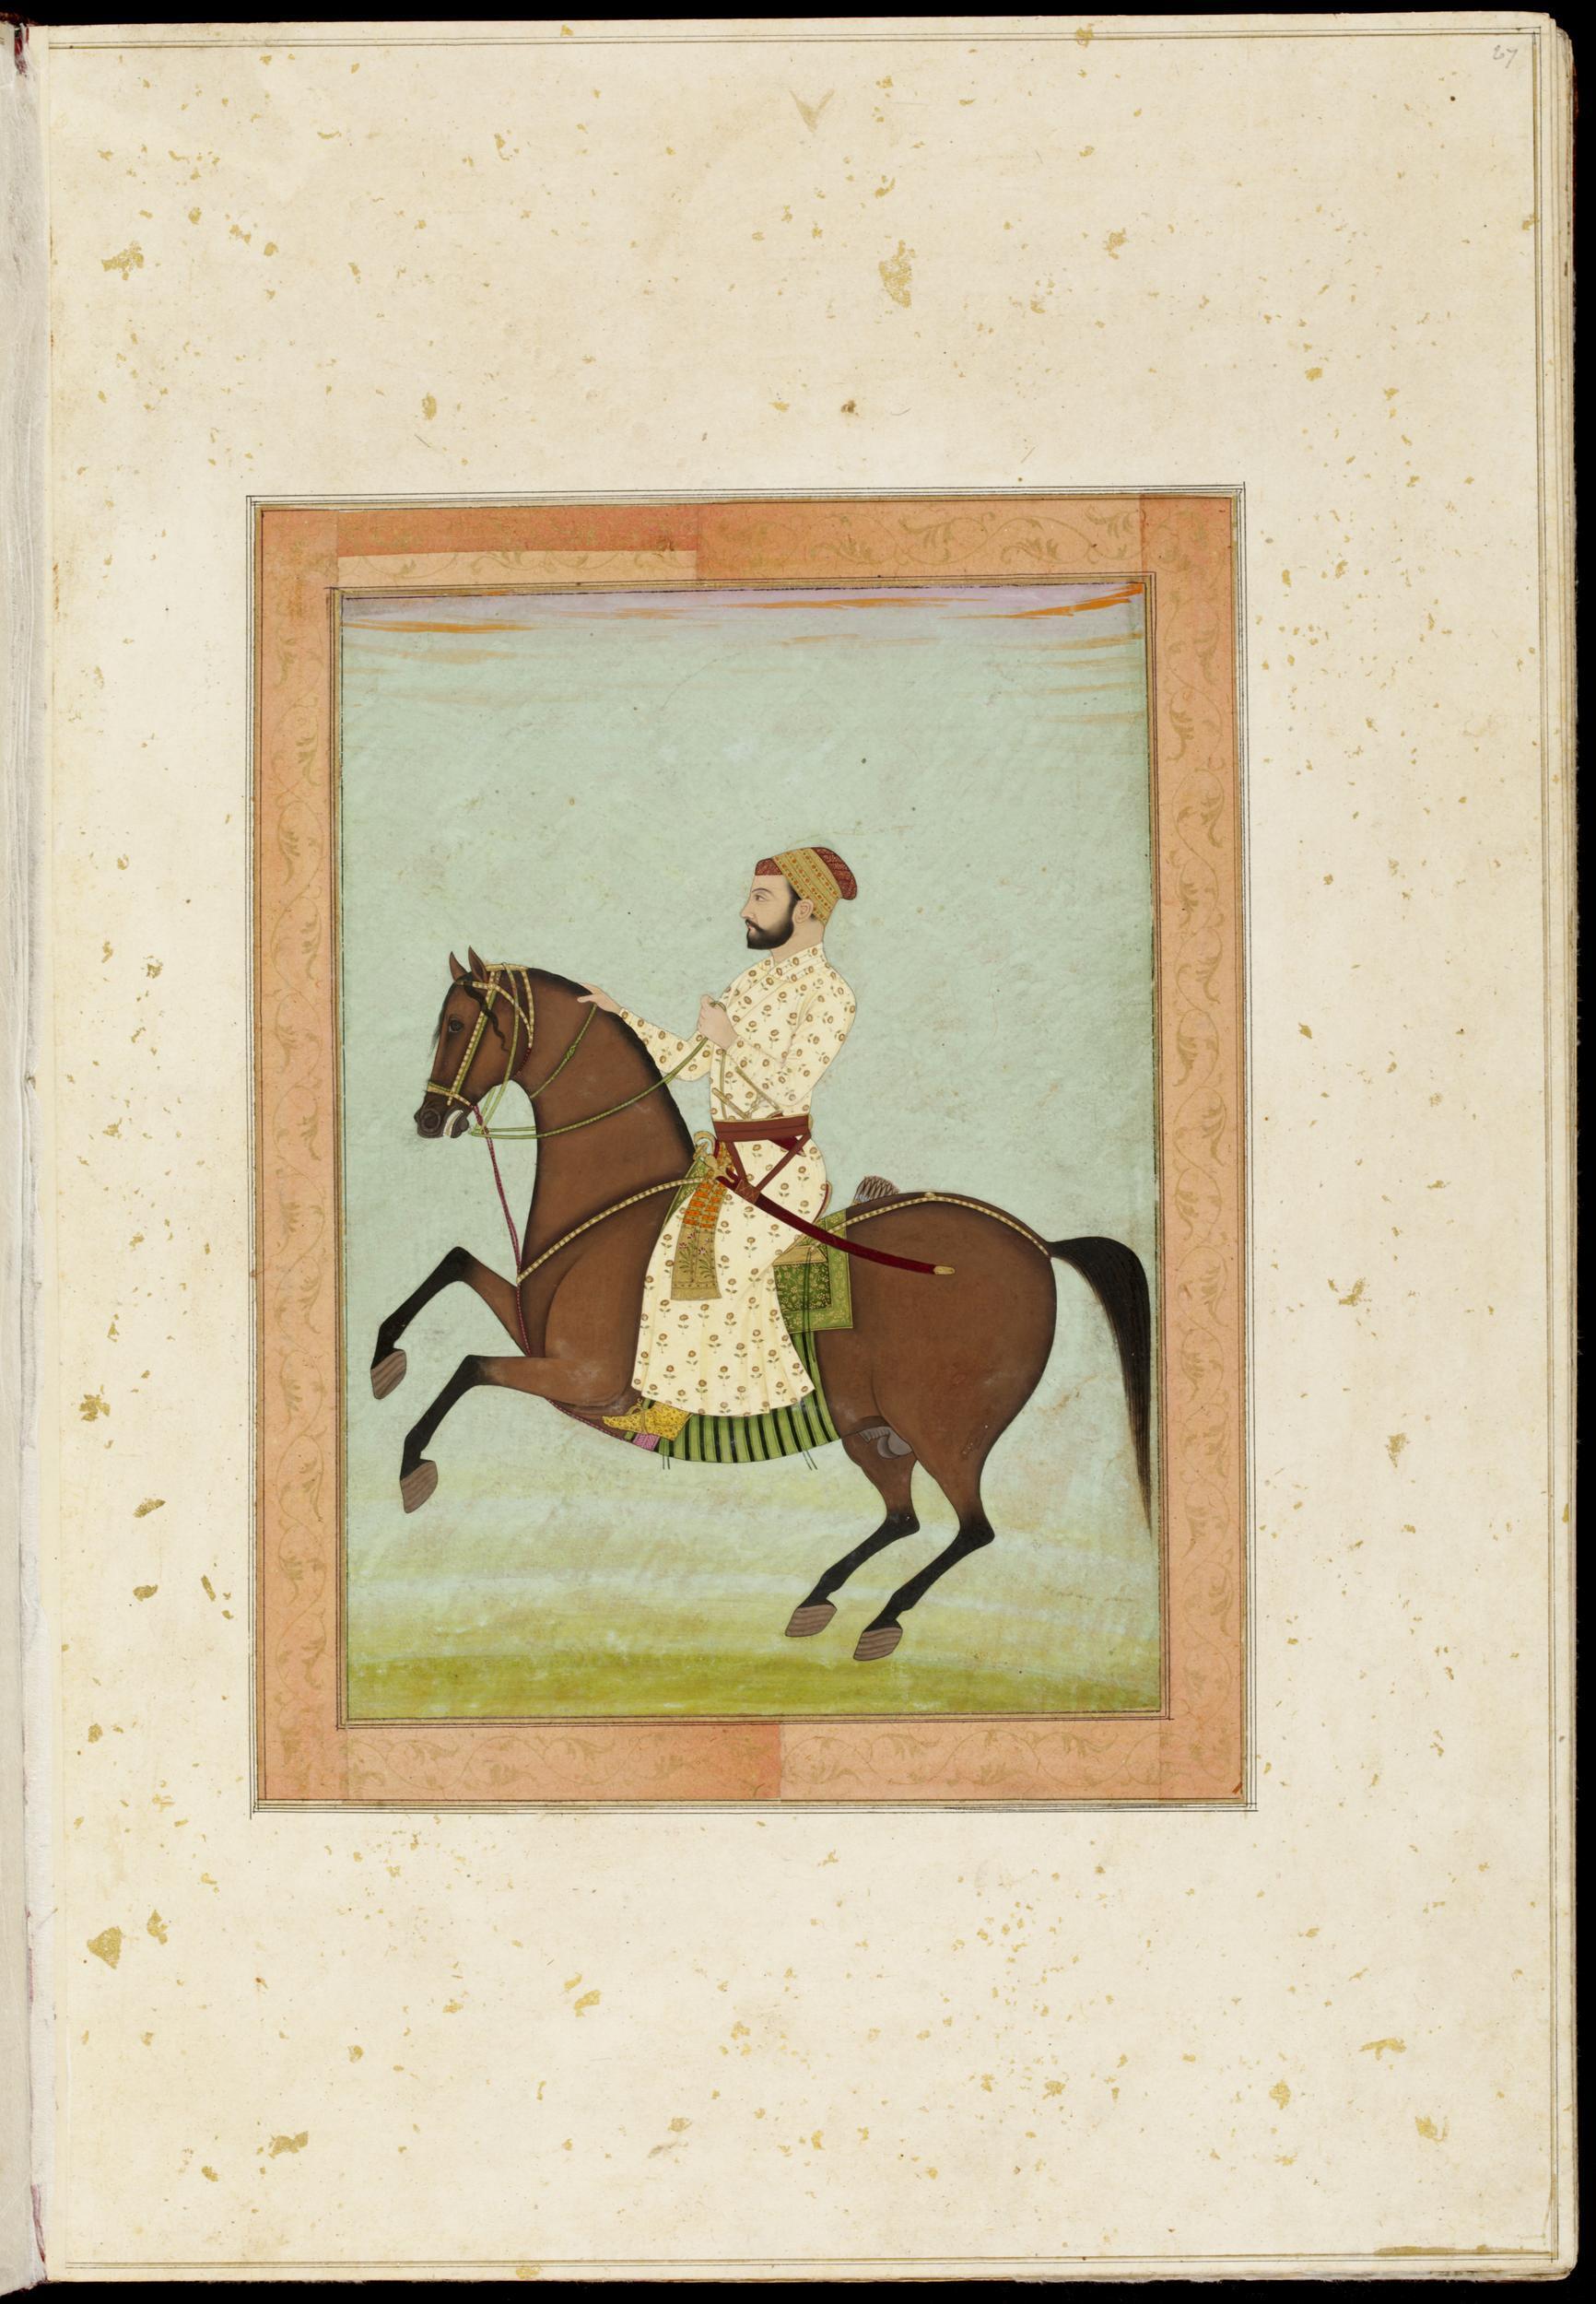 Mughal noble on horseback, cr. 1790, Mughal Empire